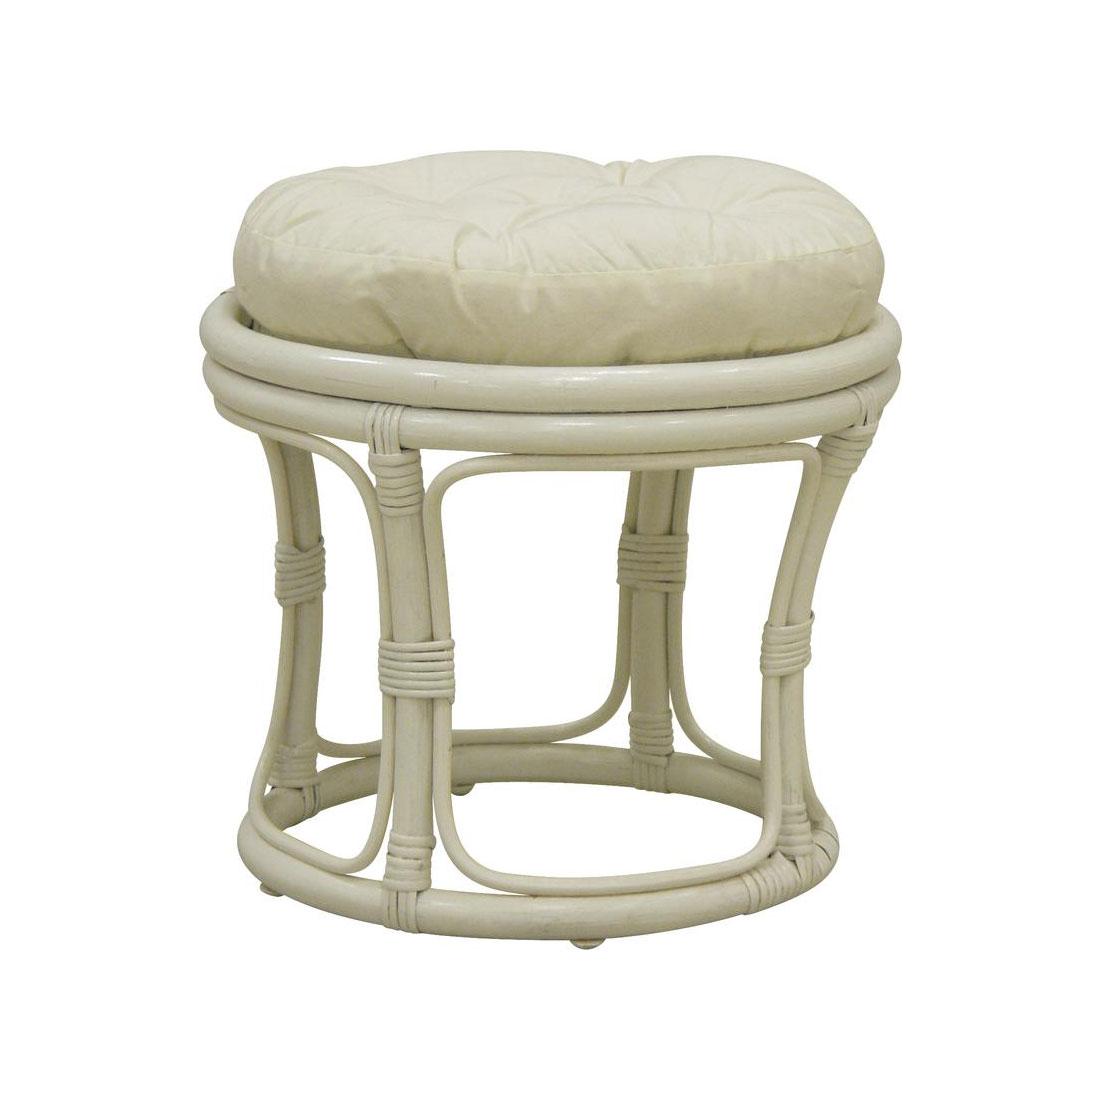 pouf bois rotin blanc laqu avec coussin cru 5475. Black Bedroom Furniture Sets. Home Design Ideas